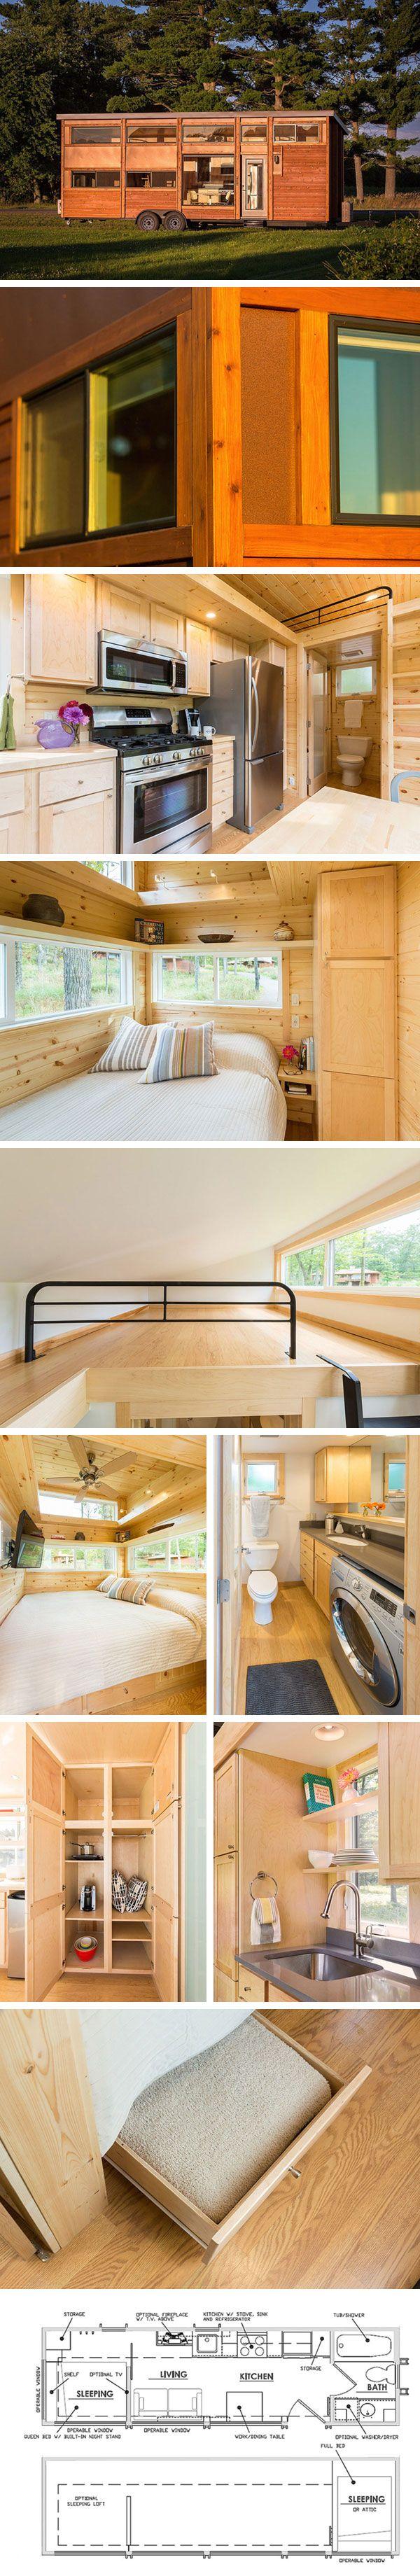 Дом на колесах Traveler XL от Escape Traveler #tinyhomesdigest #tinyhouse #houseonwheels #camper